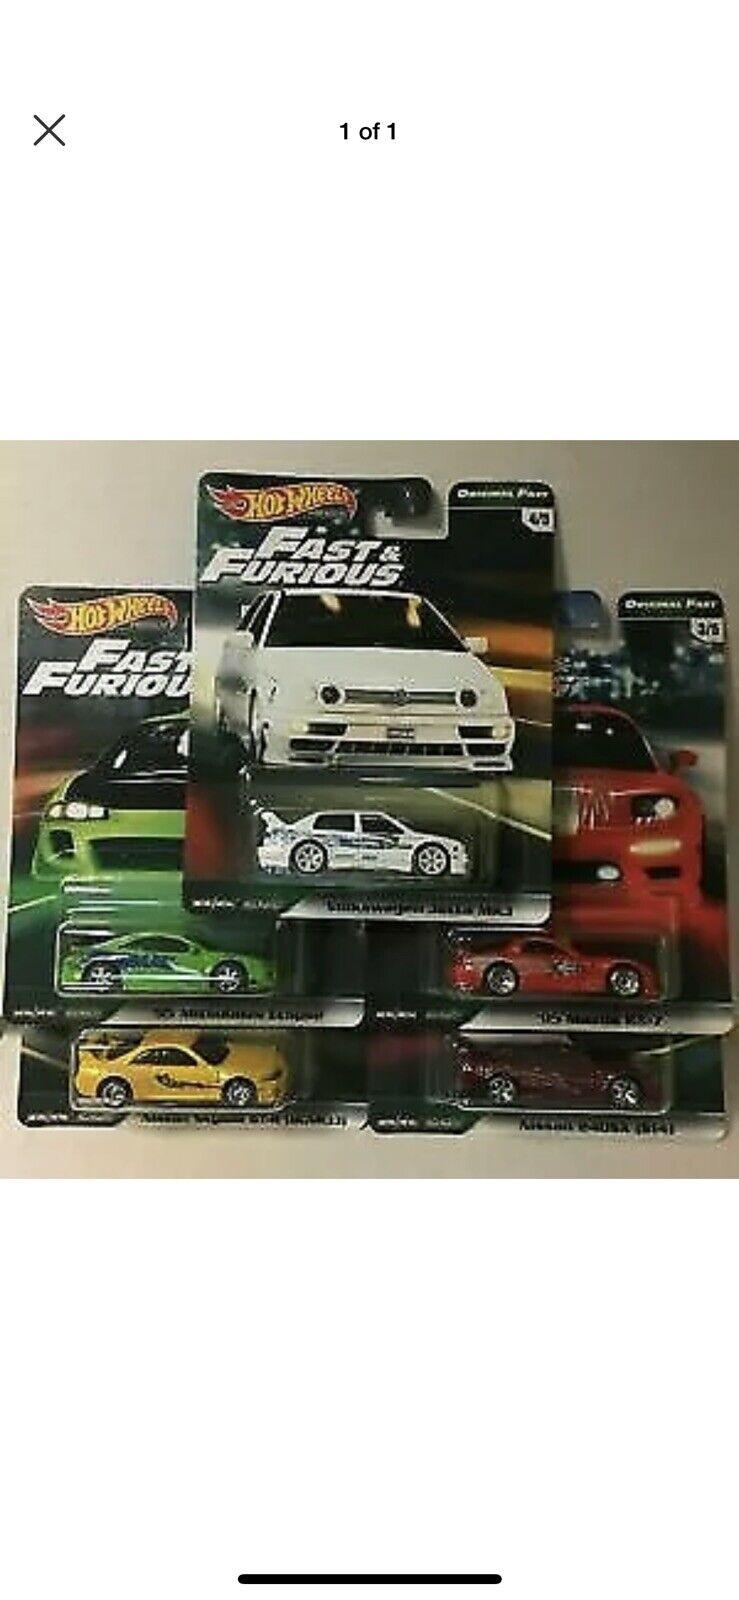 Hot Wheels Fast & Furious Original Set